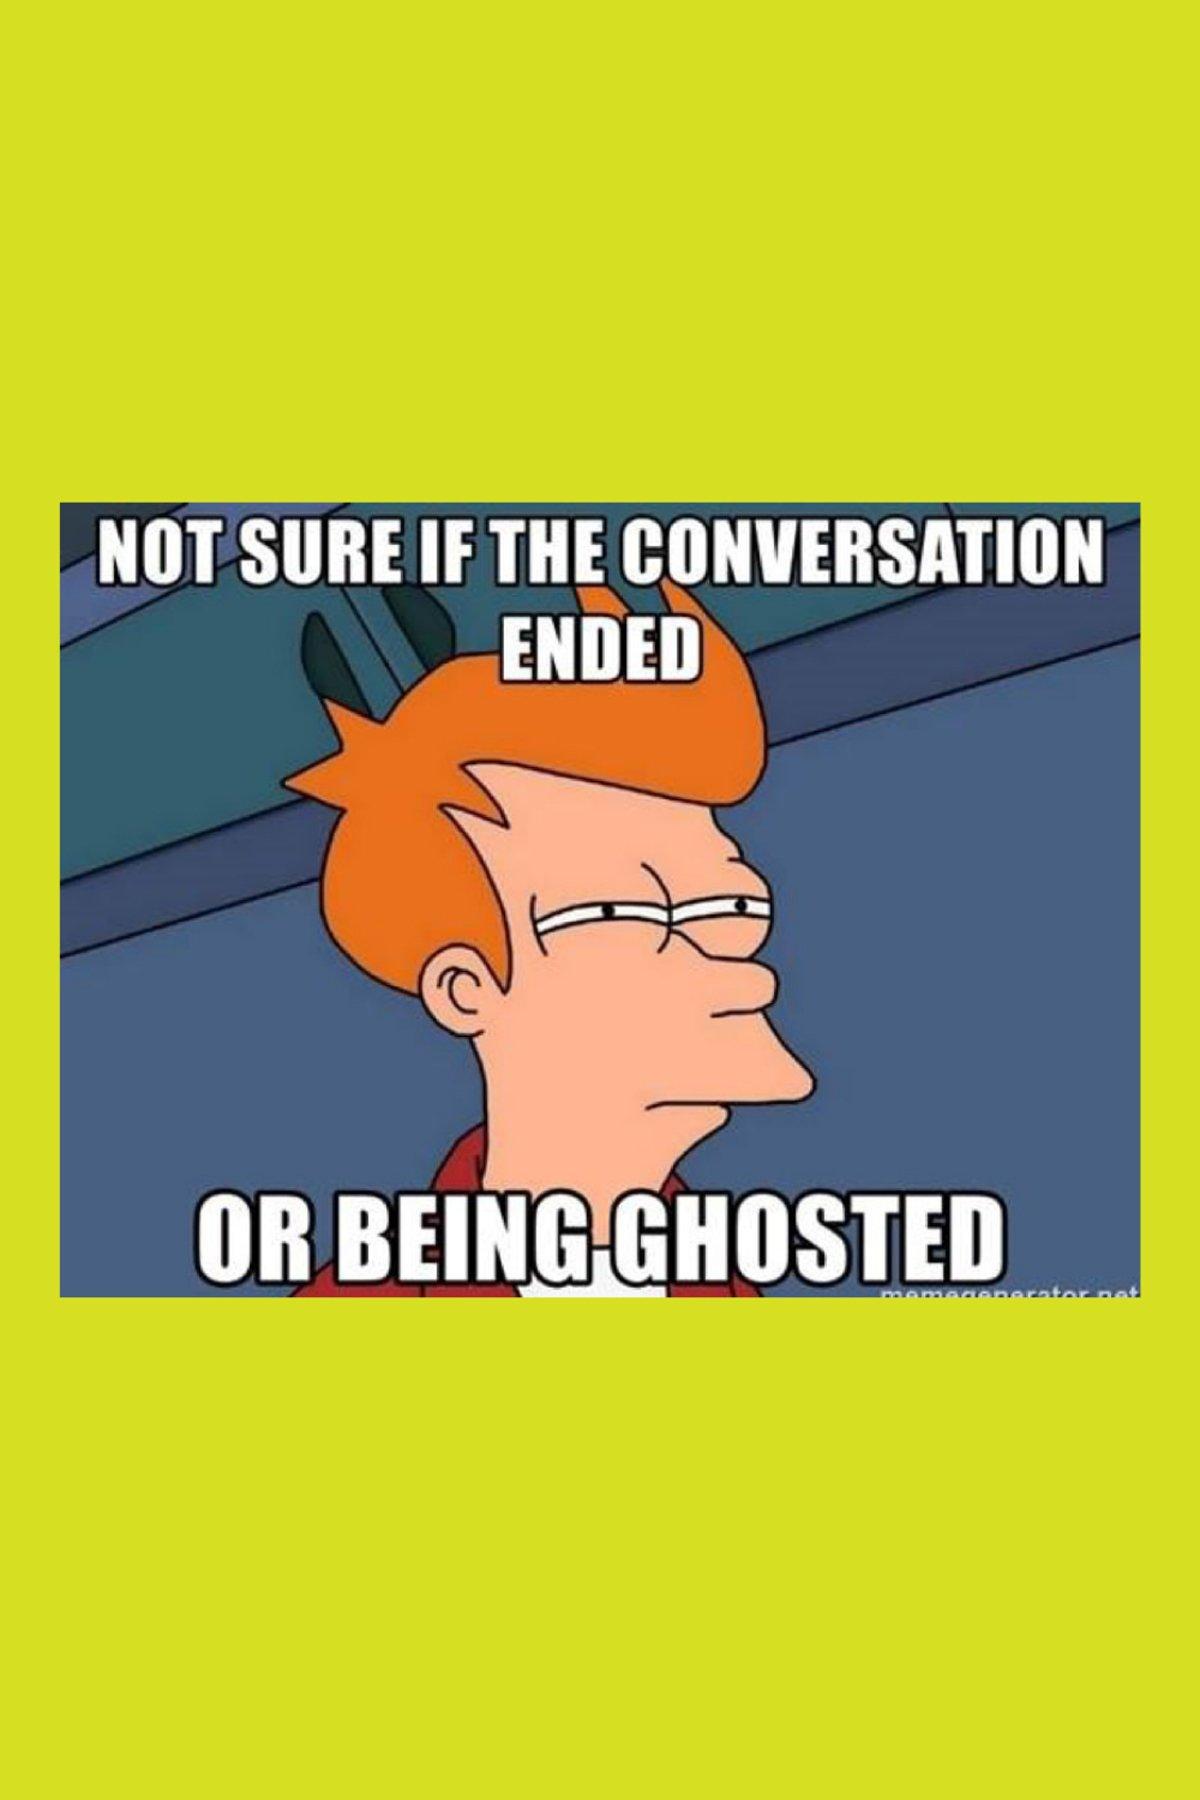 Funny Ghosting Meme